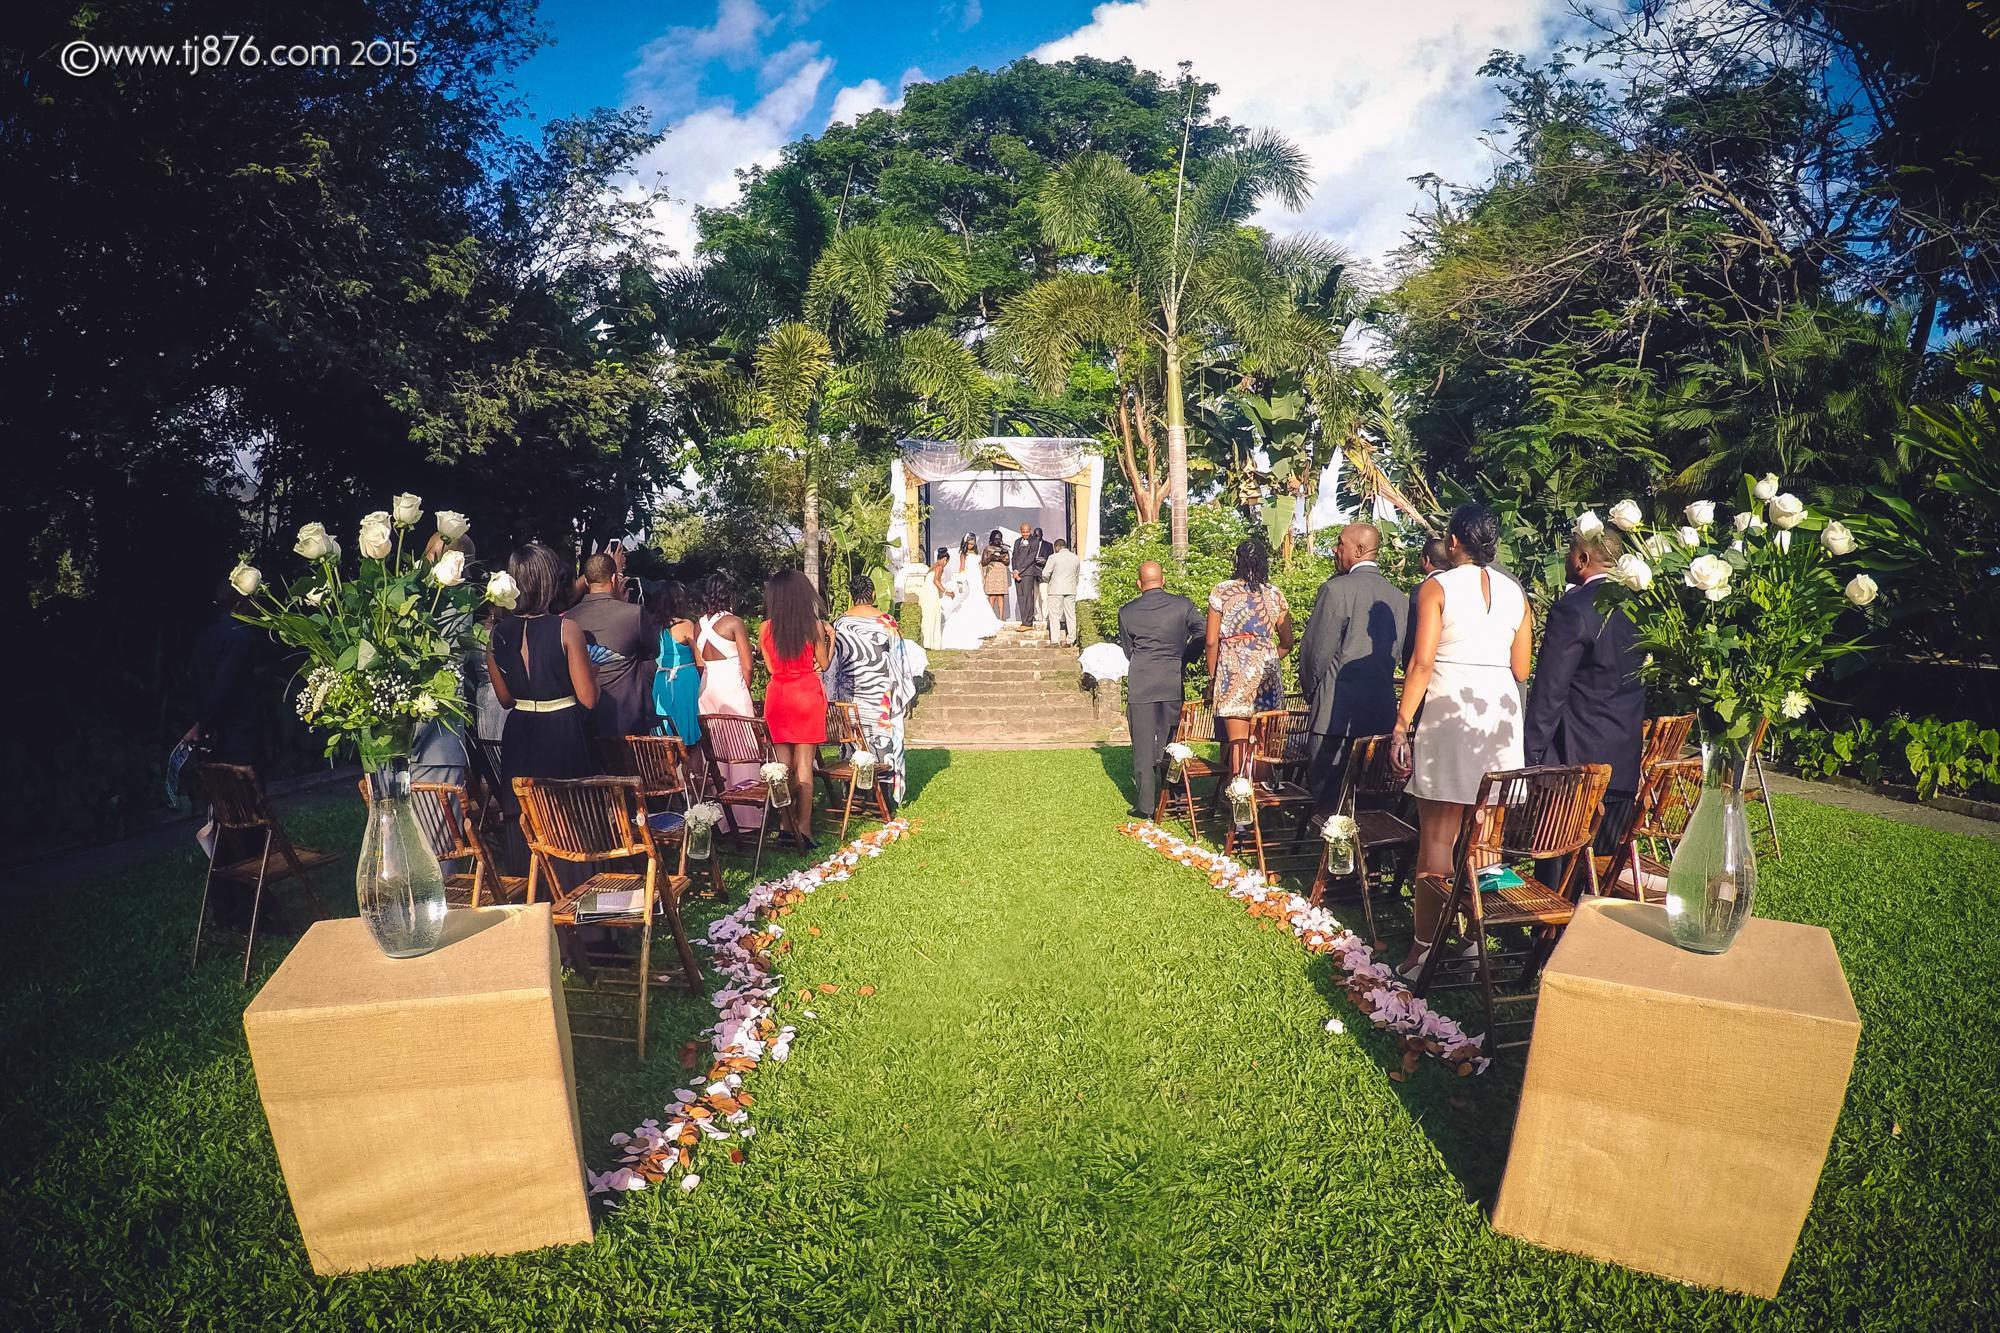 Jamaican Wedding Photographer | Tj876 Jamaican Lifestyle Photography